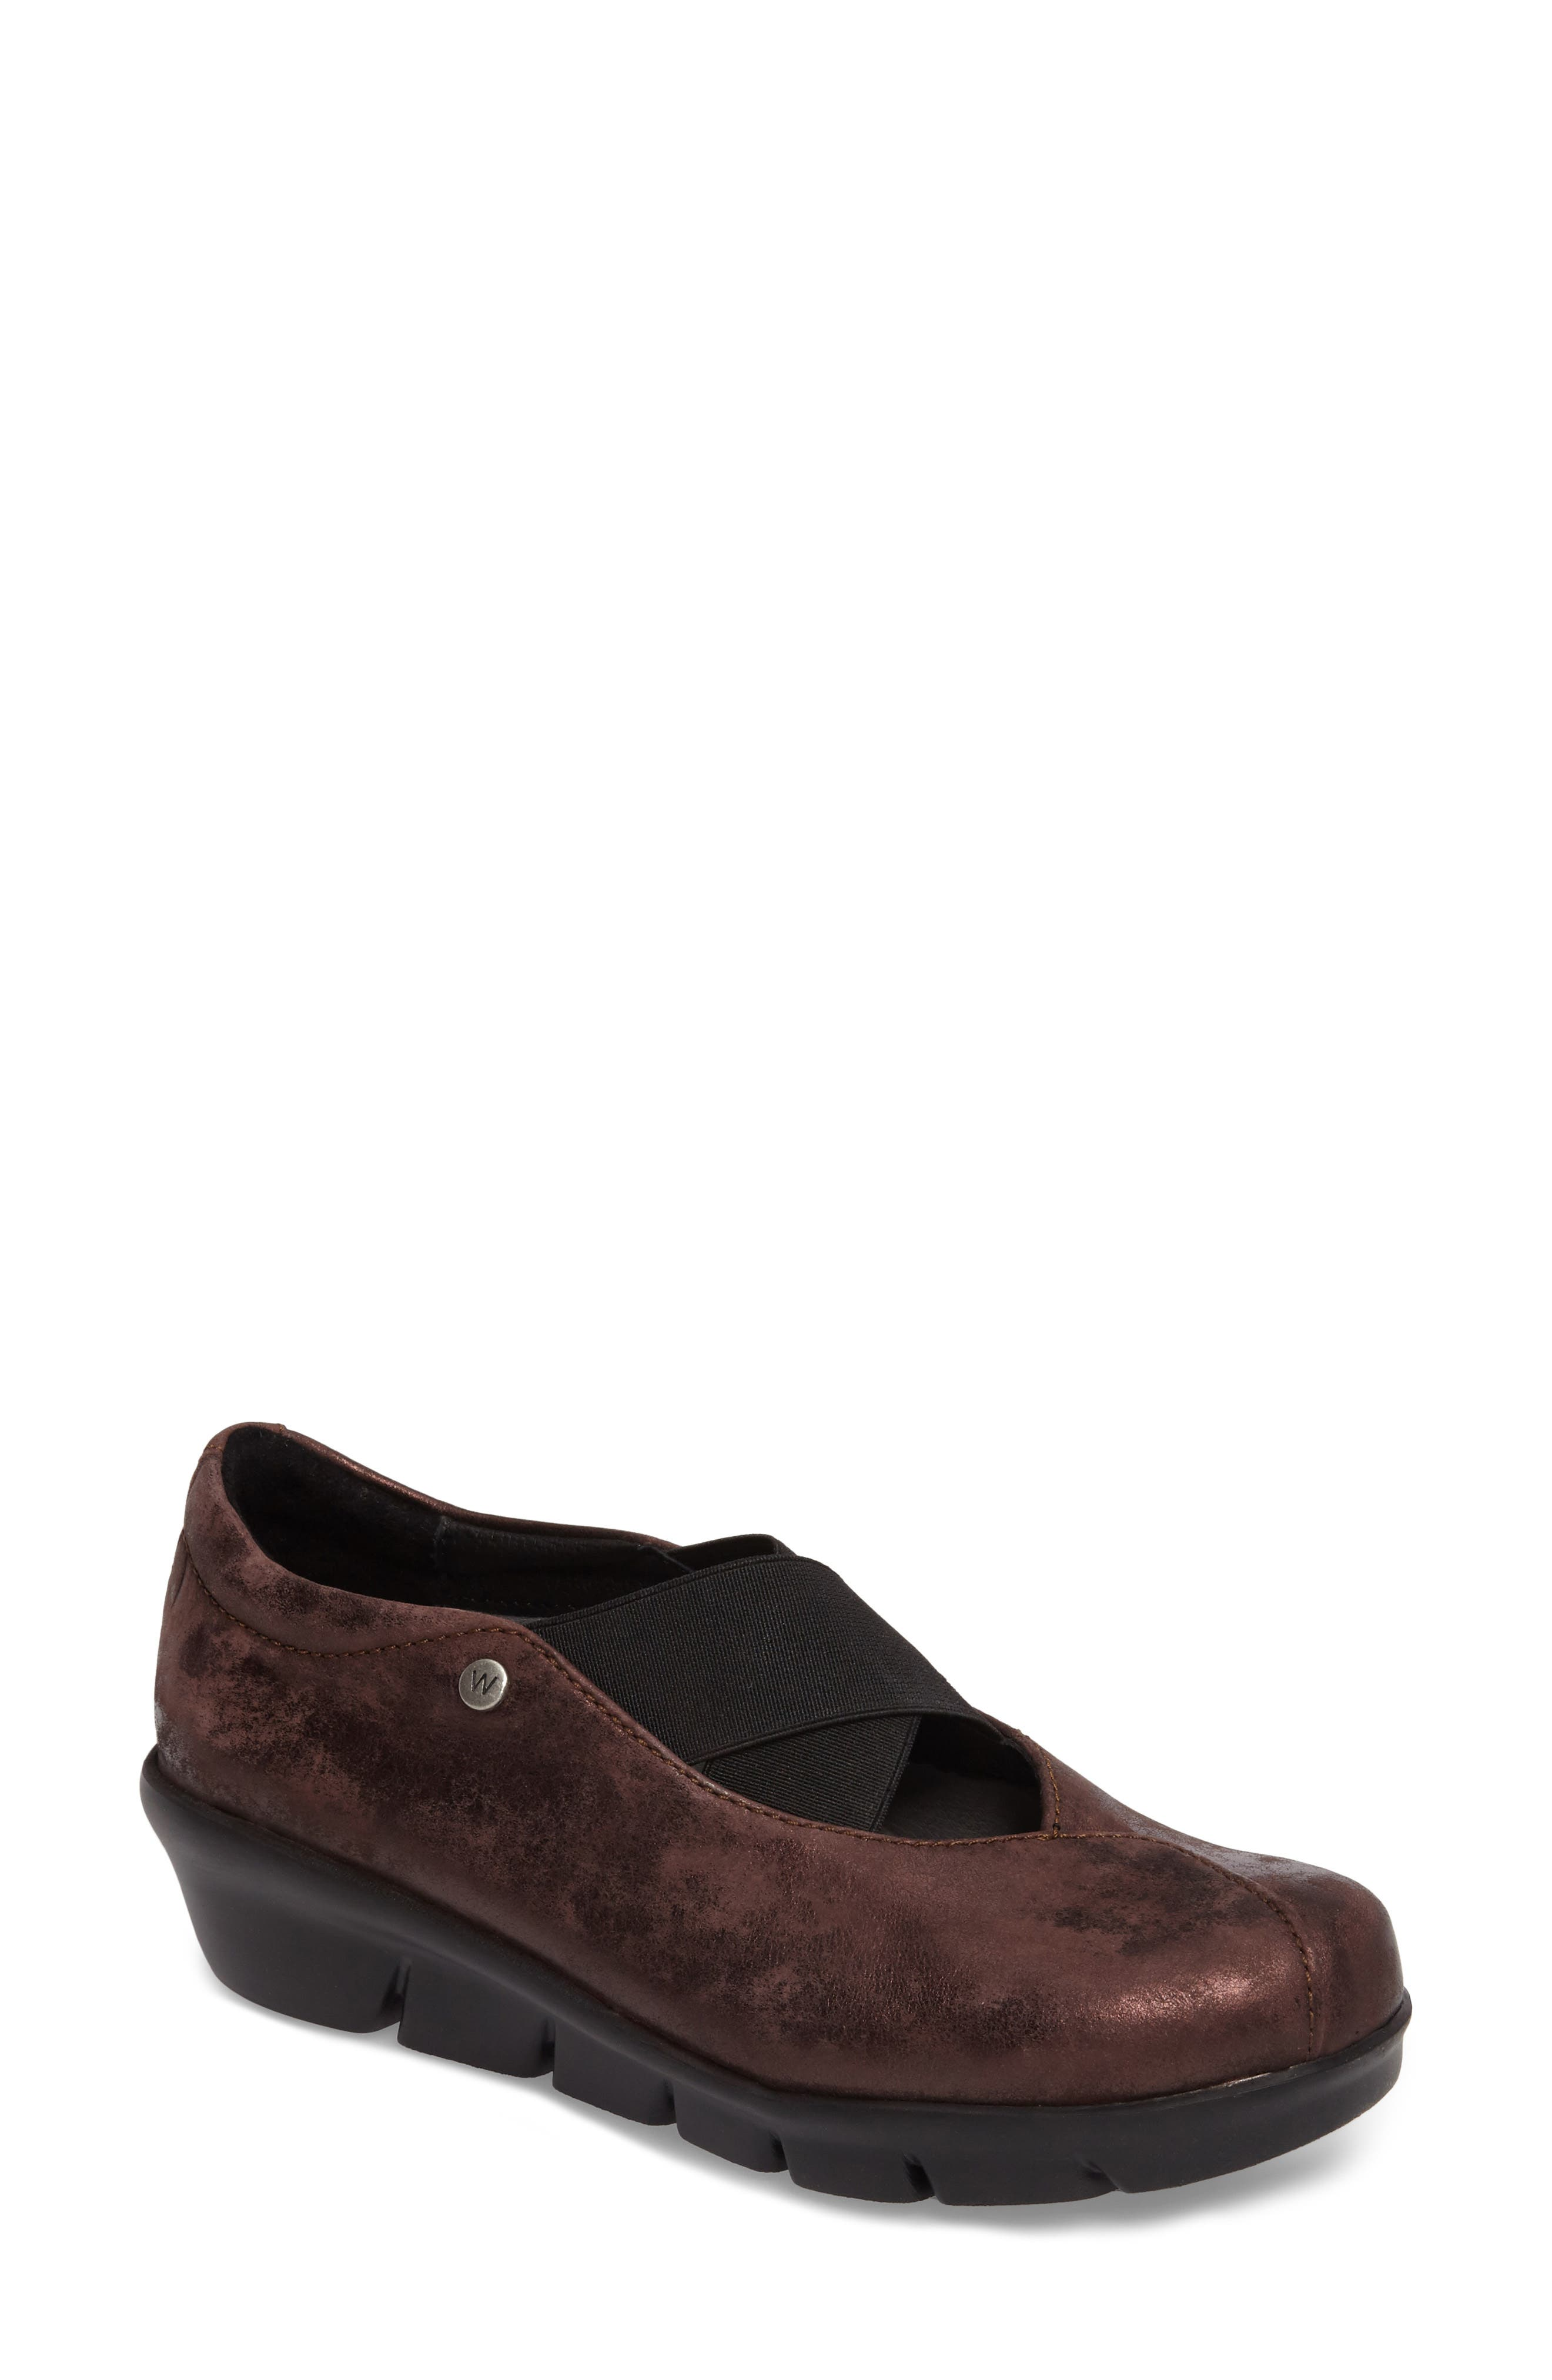 Wolky Cursa Slip-On Sneaker - Brown